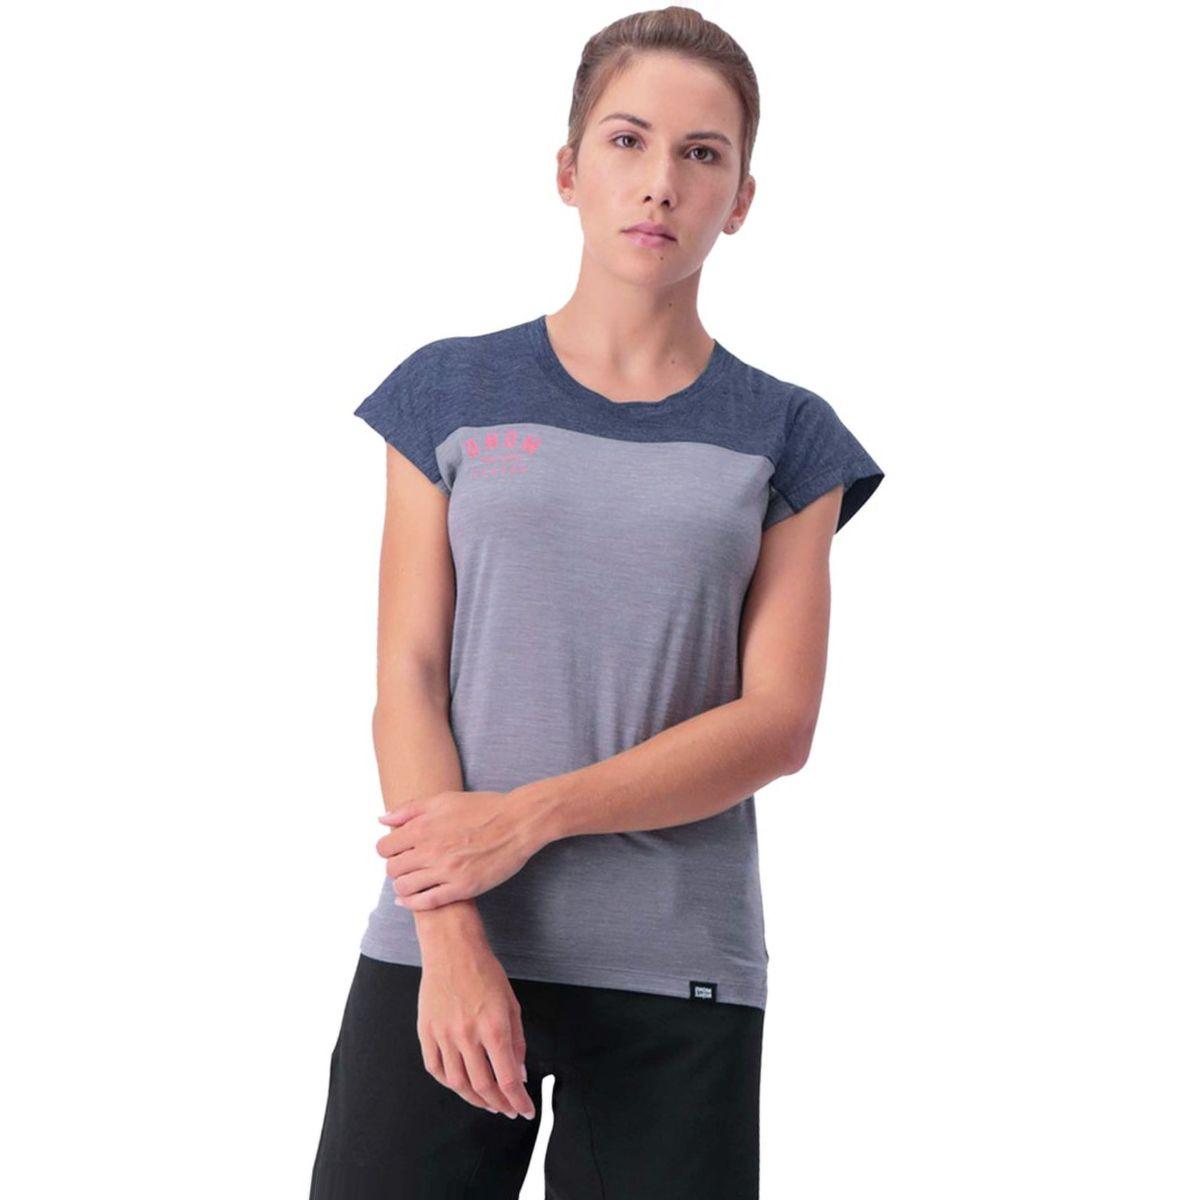 Mons Royale Zephyr Lite T-Shirt - Women's